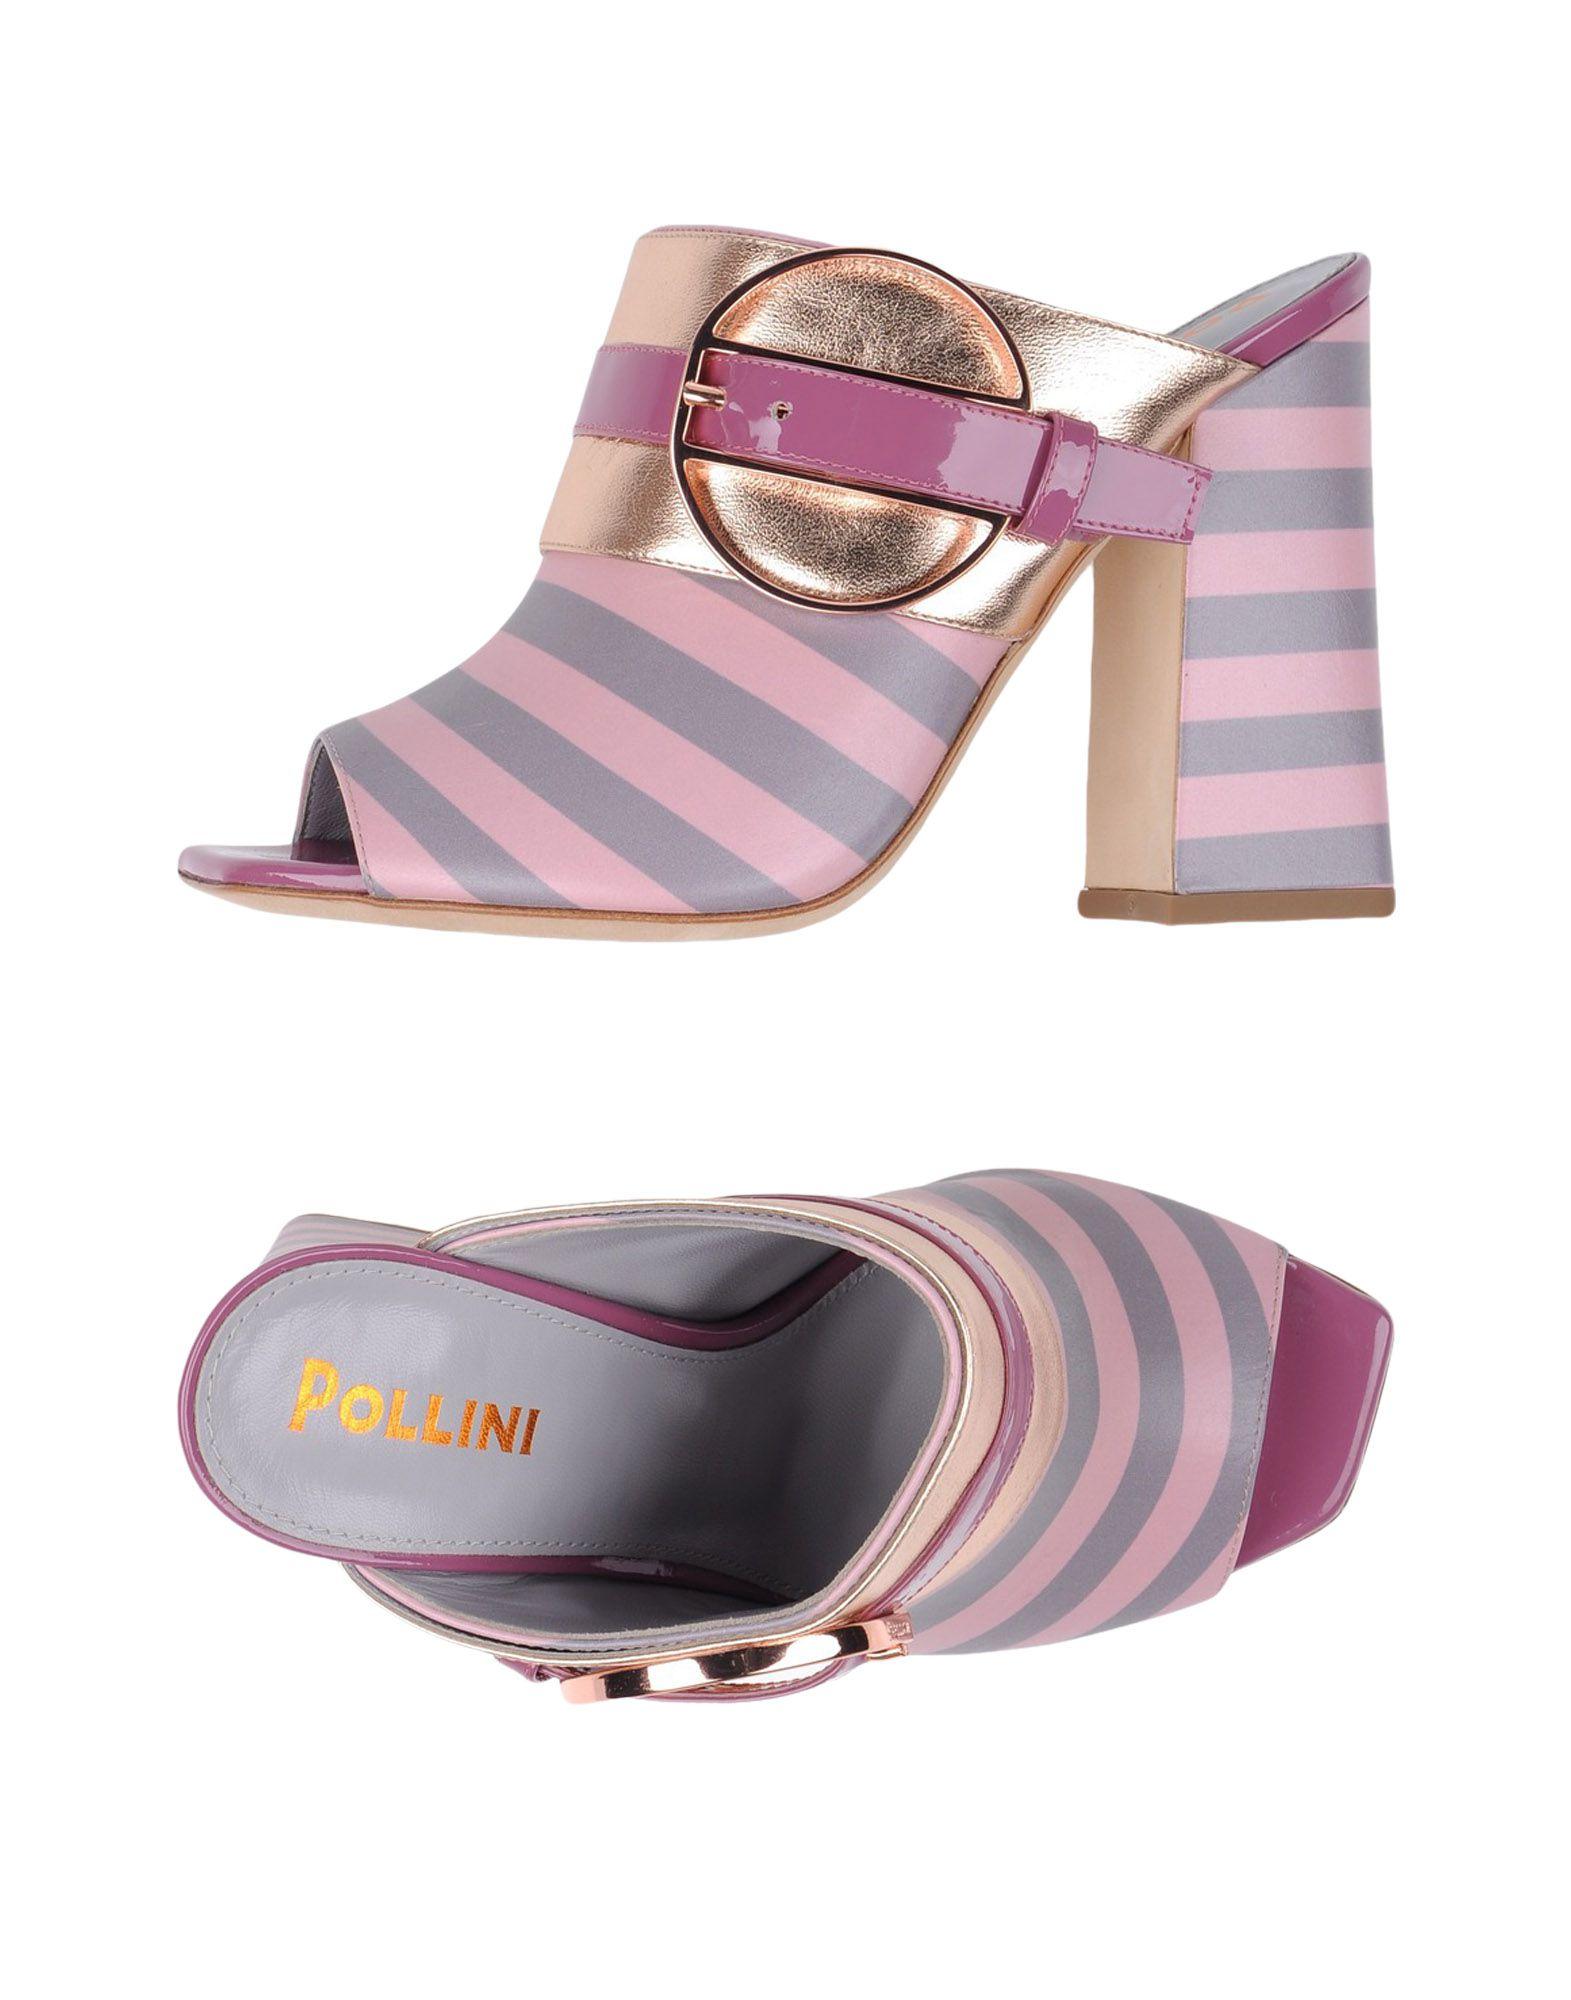 Moda Sandali Pollini Donna - 11331235LE